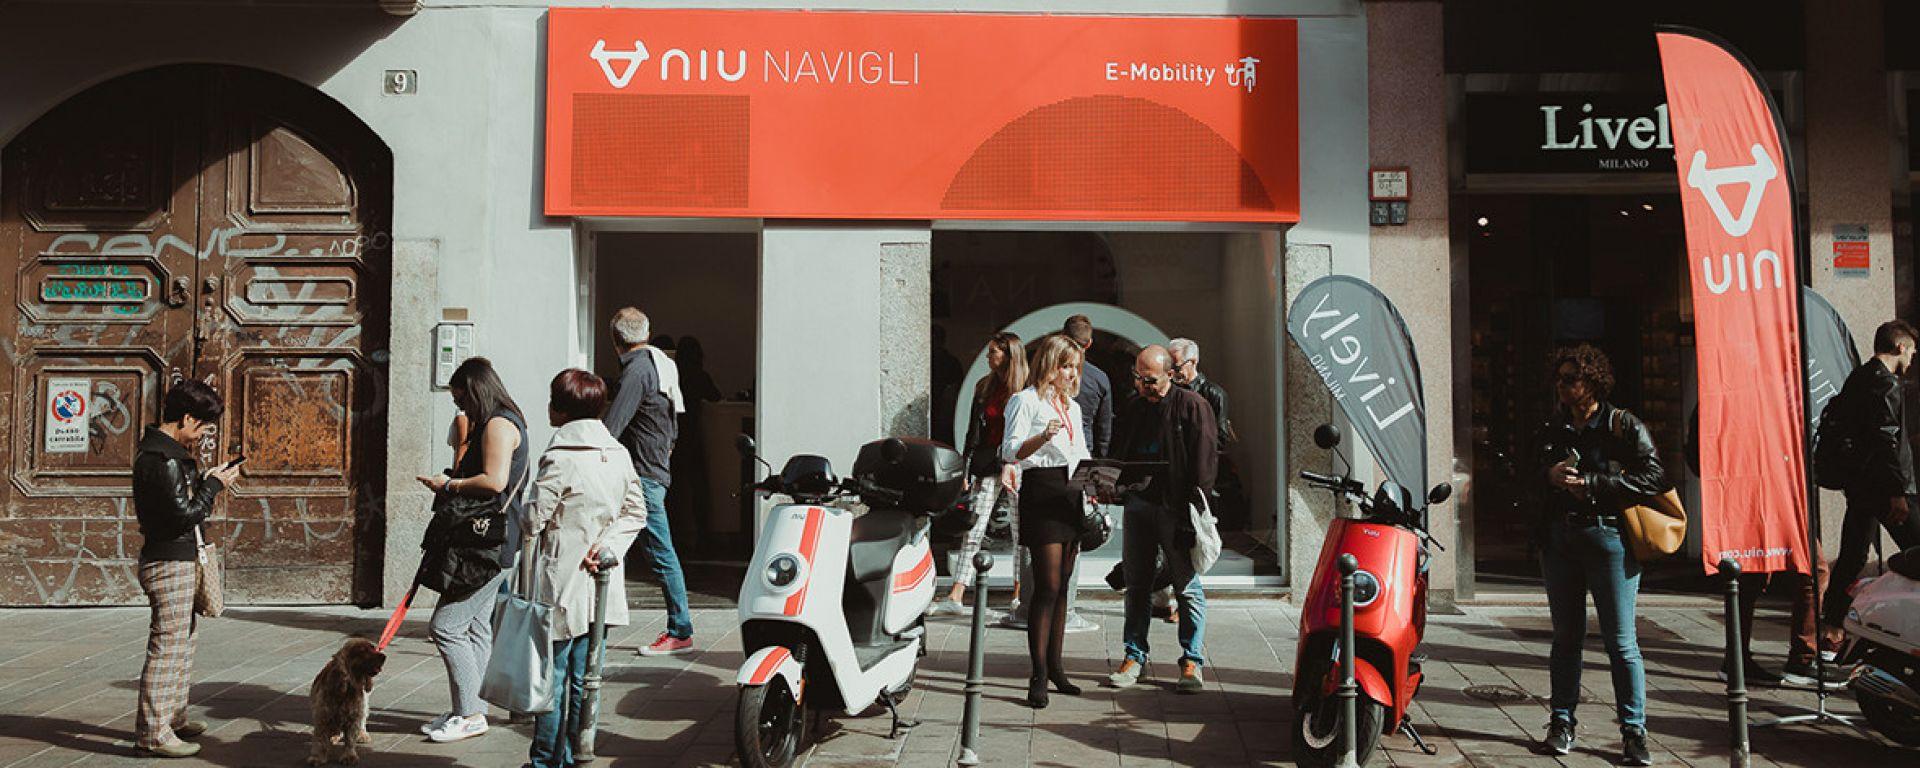 Il flagship store Niu a Milano Navigli